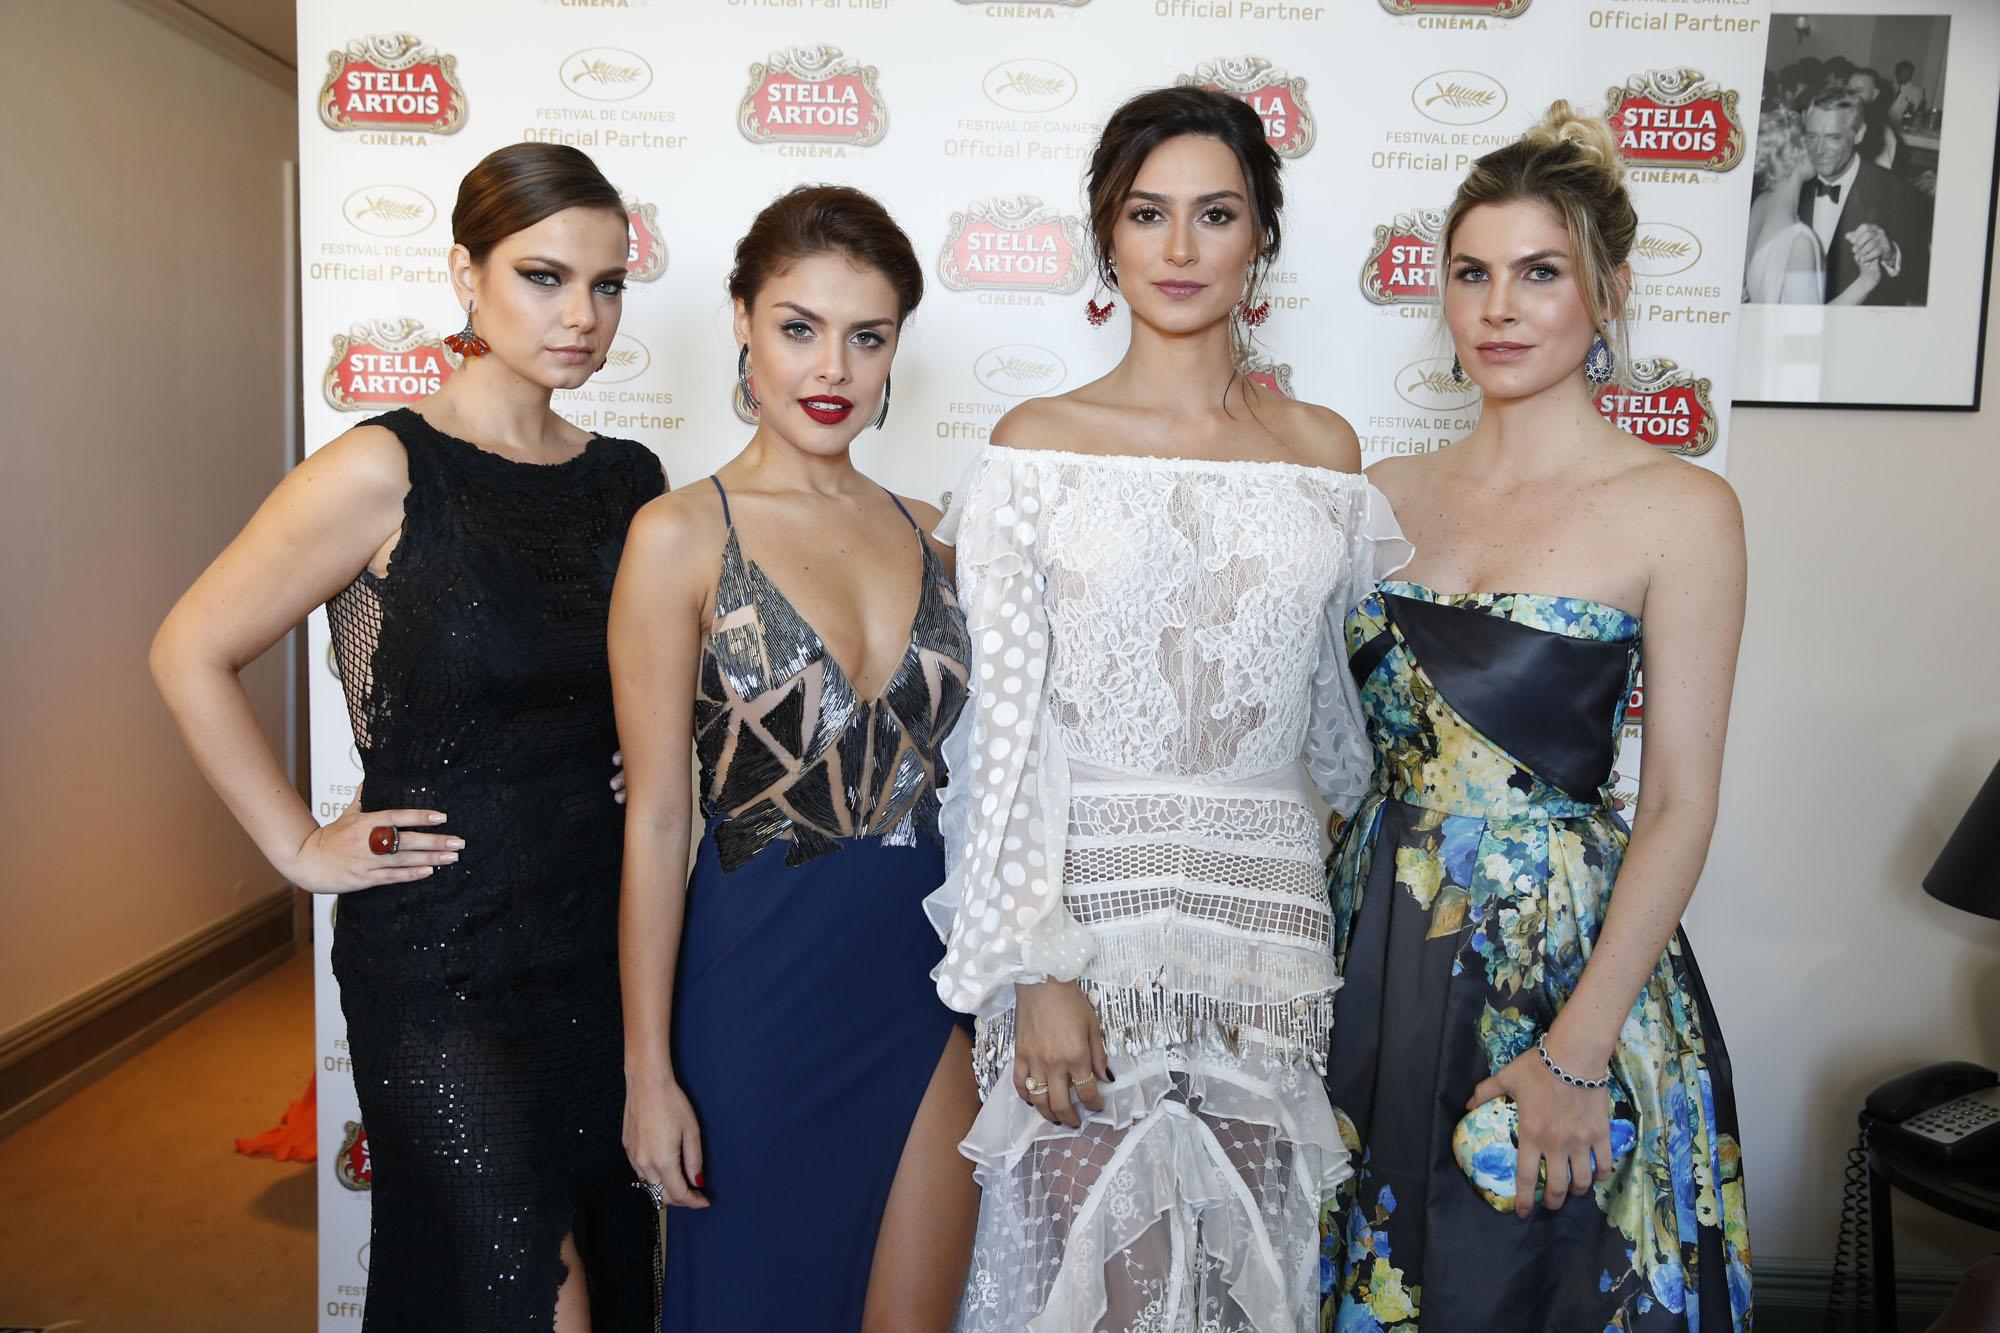 Milena Toscano, Paloma Bernardi, Thaila Ayala, Julia Faria